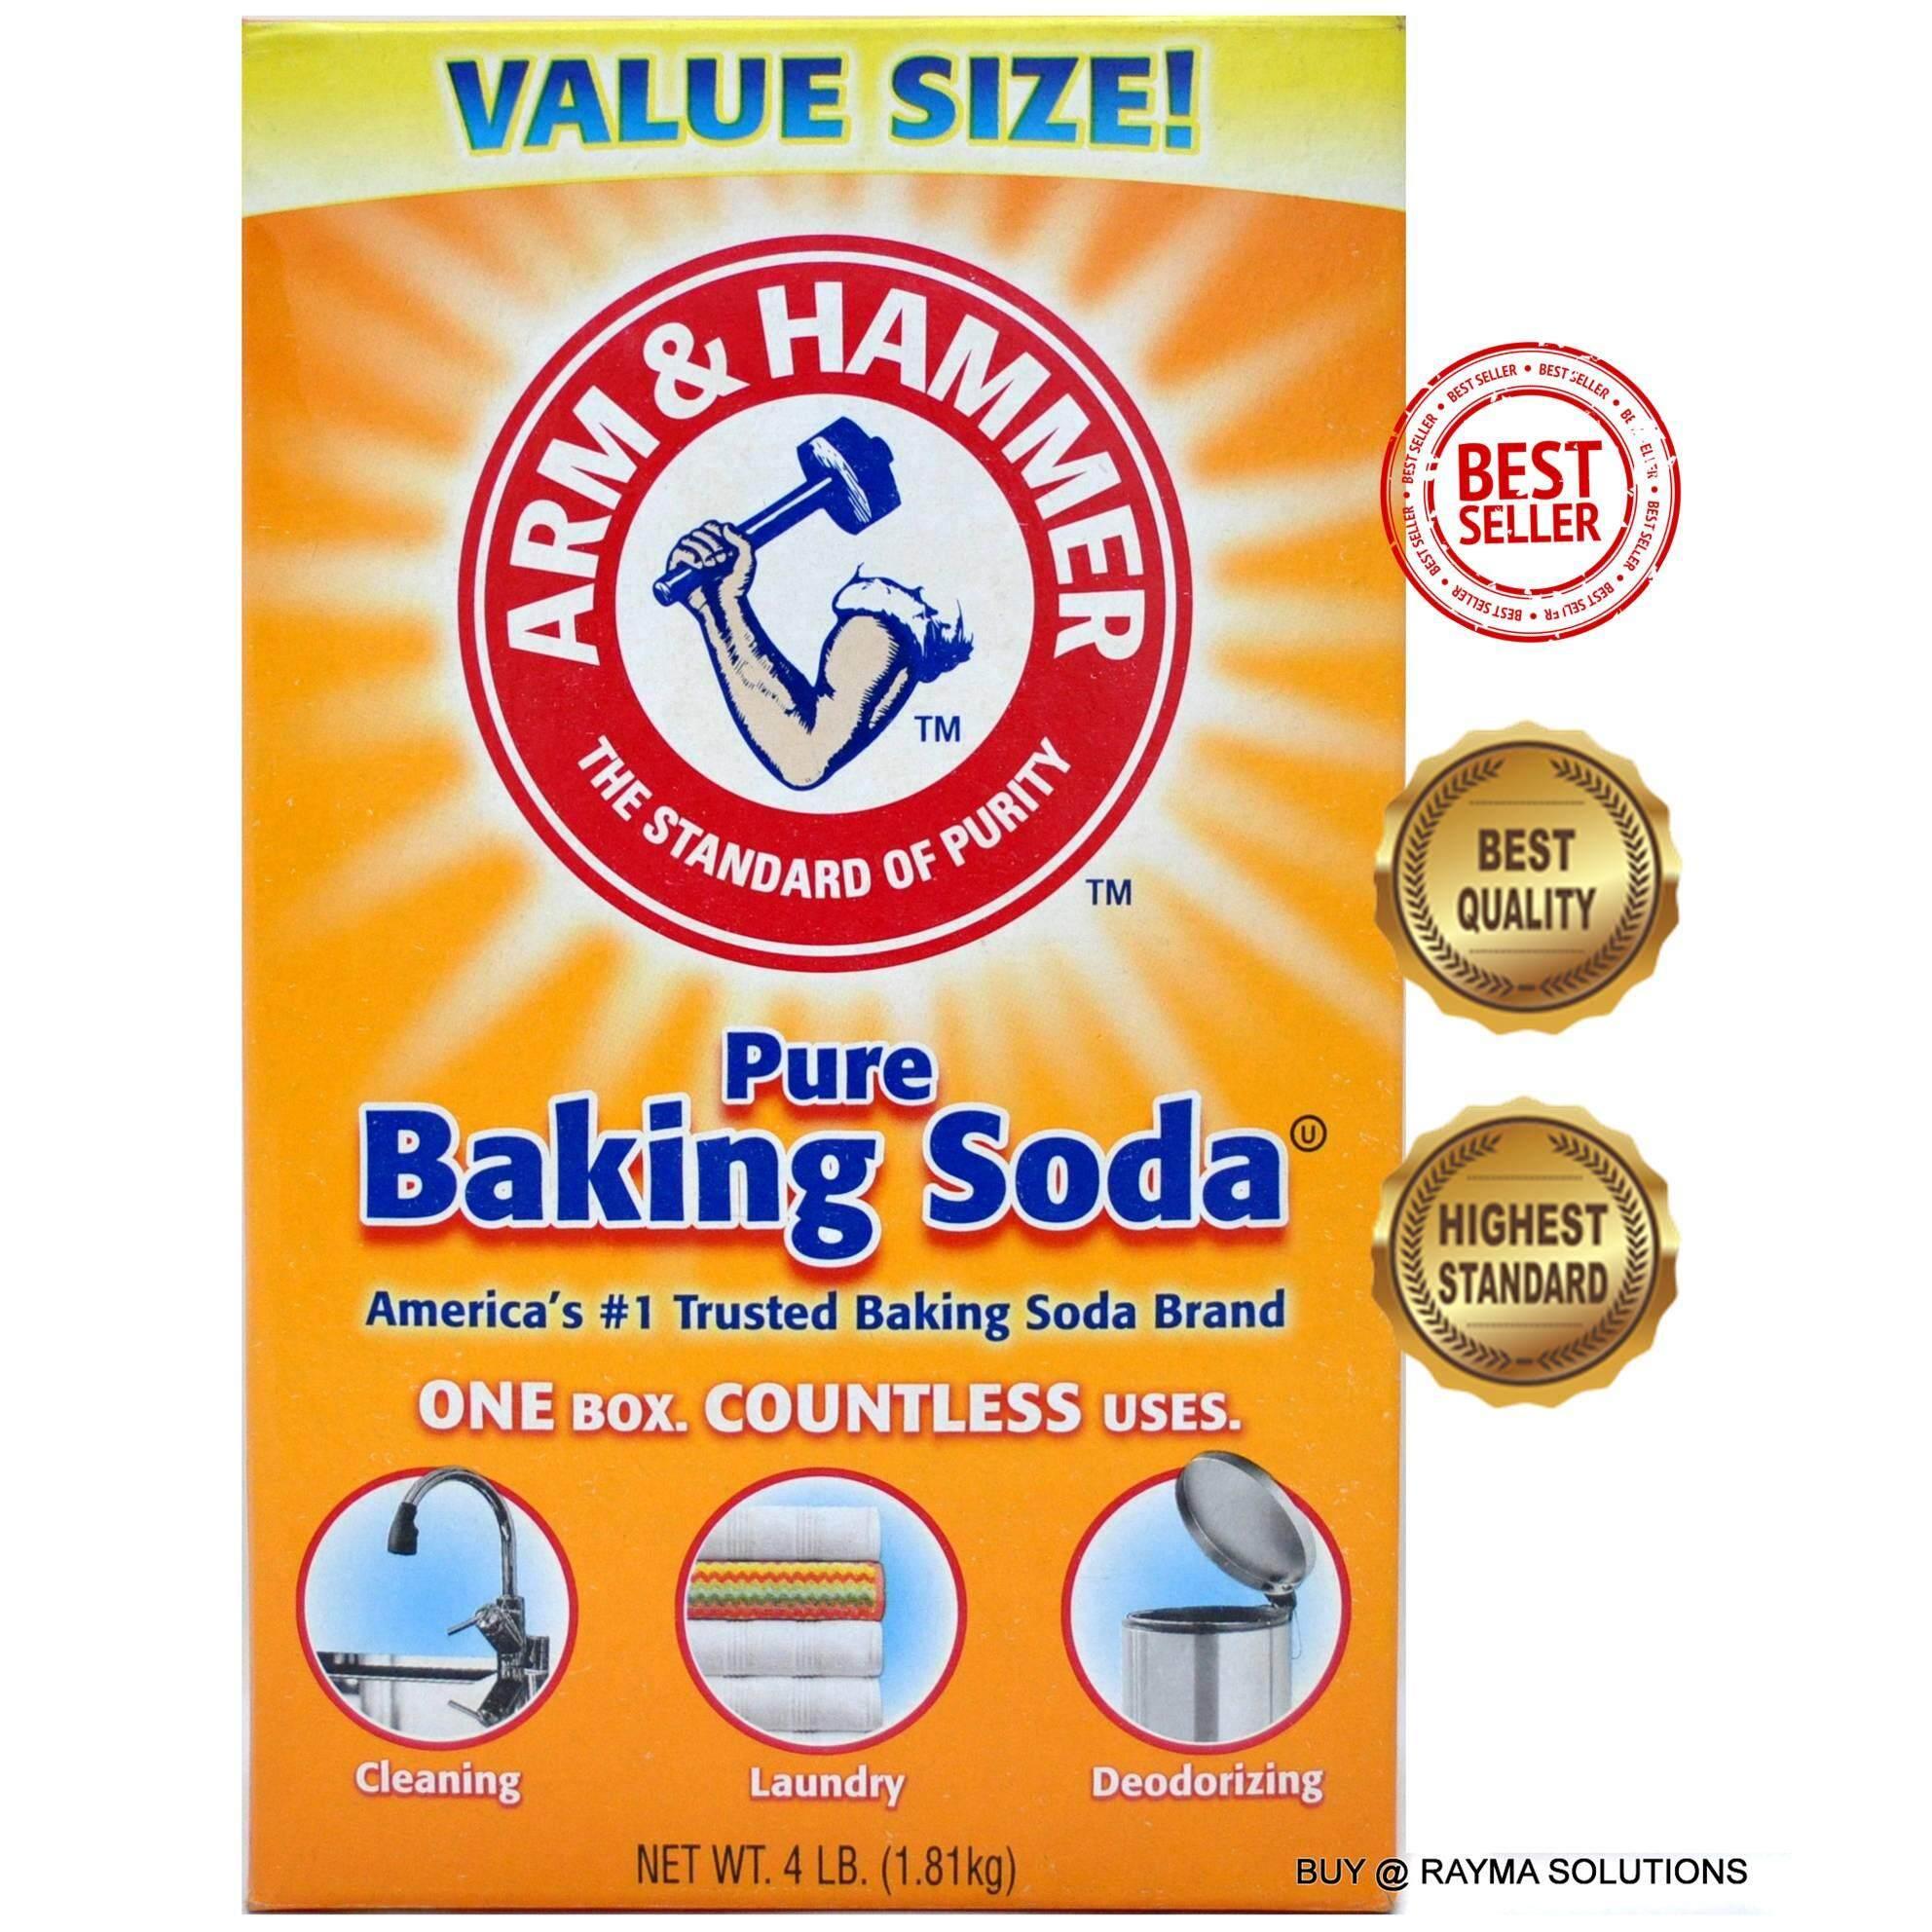 ARM & HAMMER Pure Baking Soda, Value Size, 1.81kg